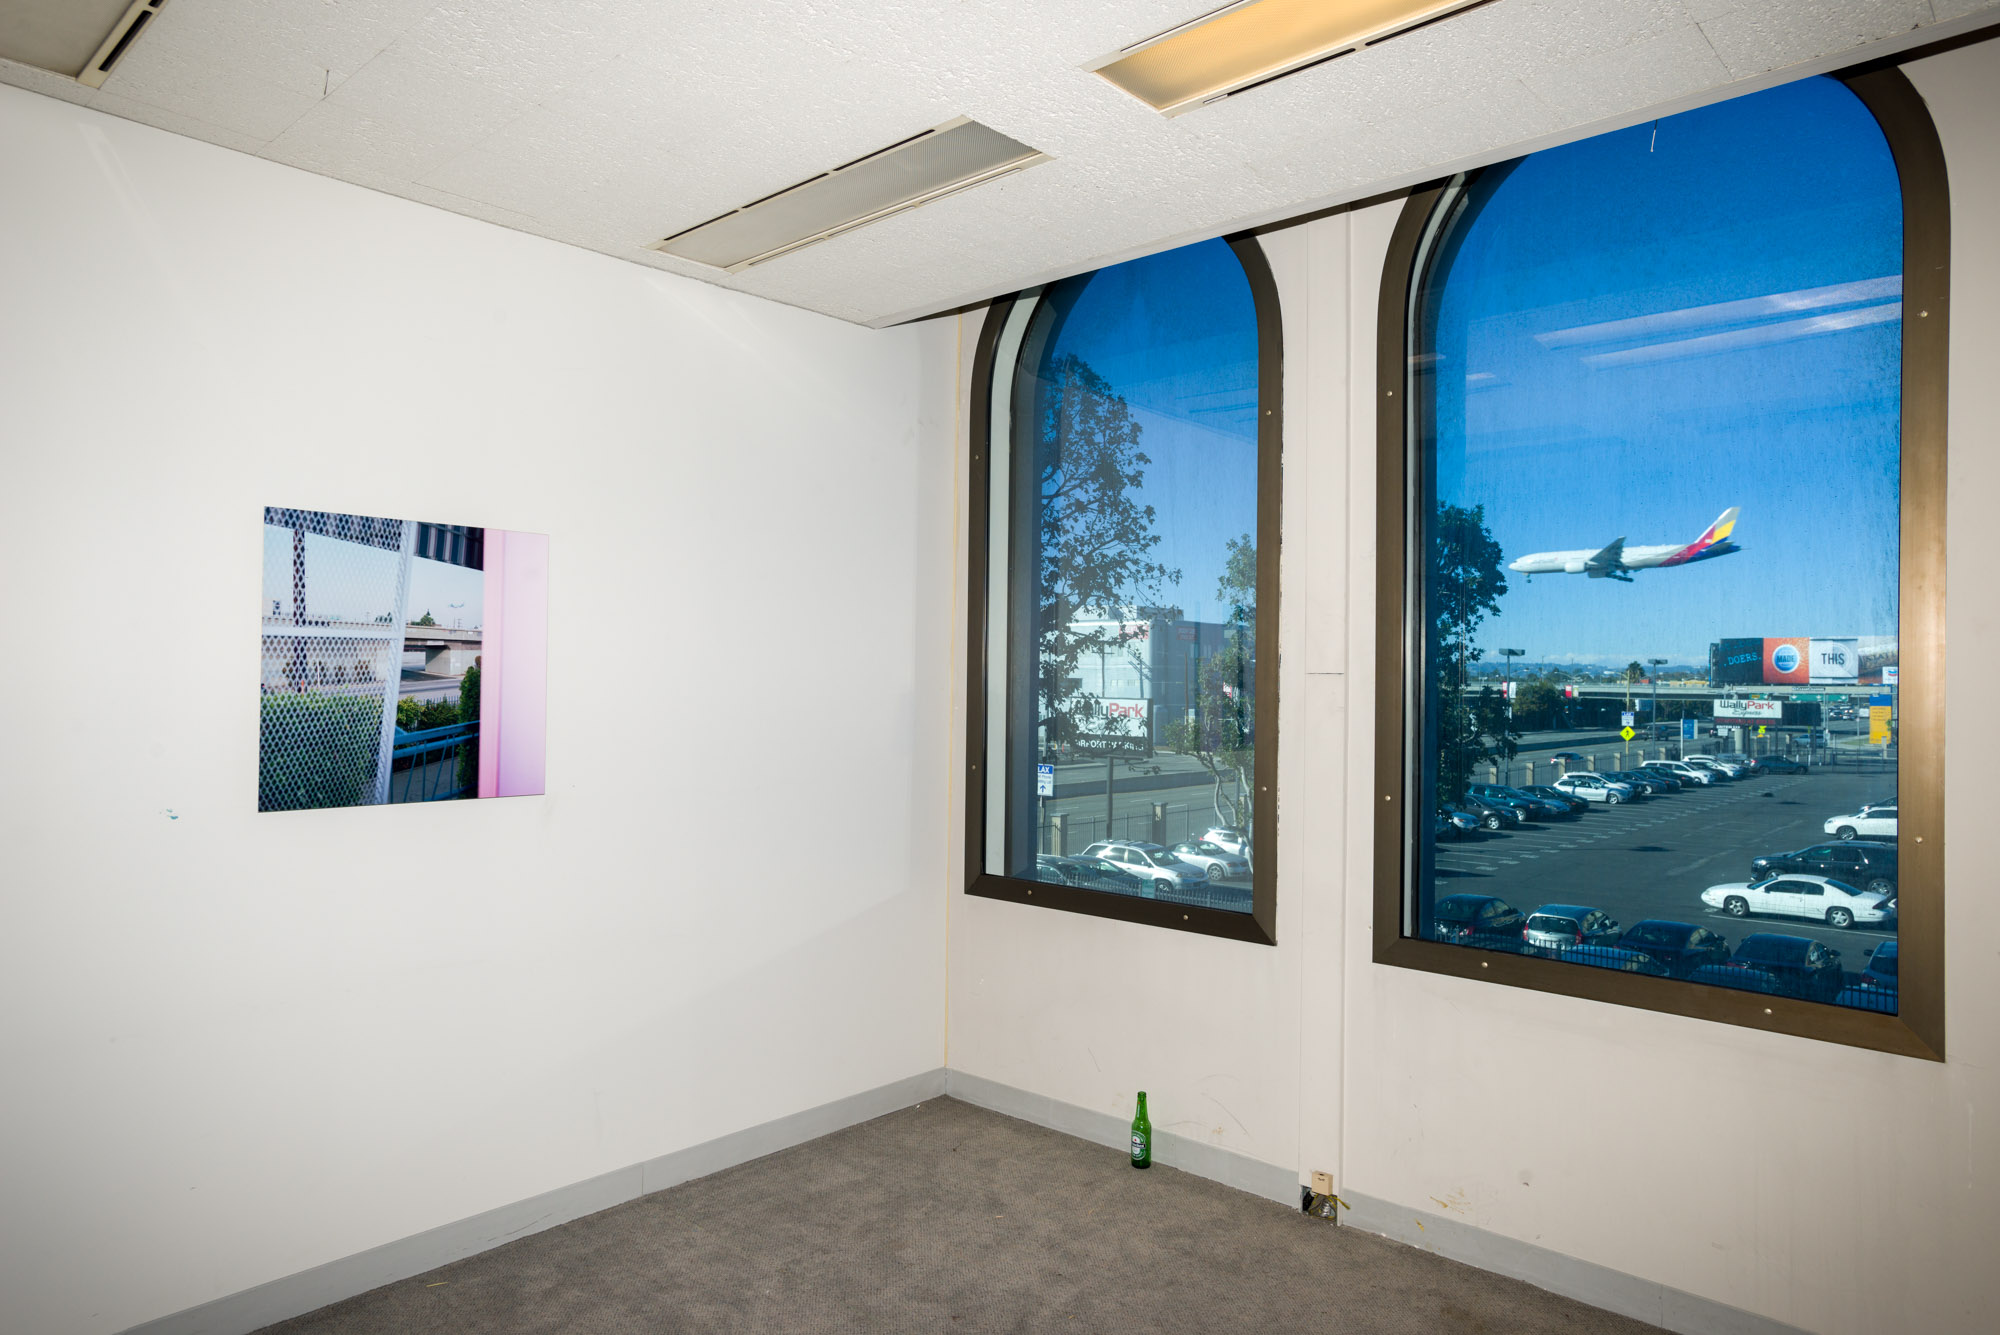 Zoe Crosher, installation view